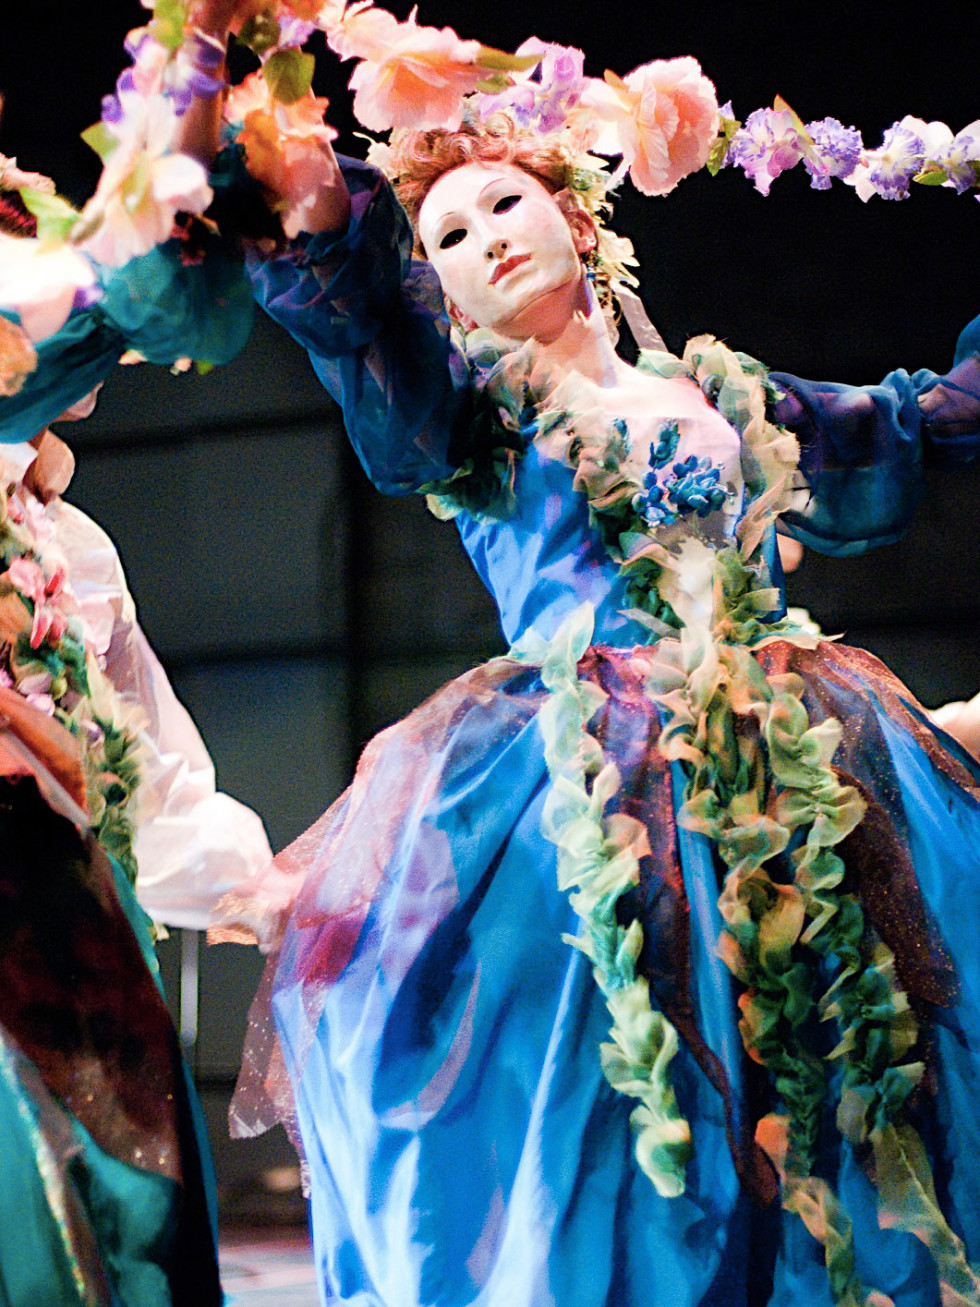 News_Nancy_fantasy season_The New York Baroque Dance Company_Garland Dance_Act II